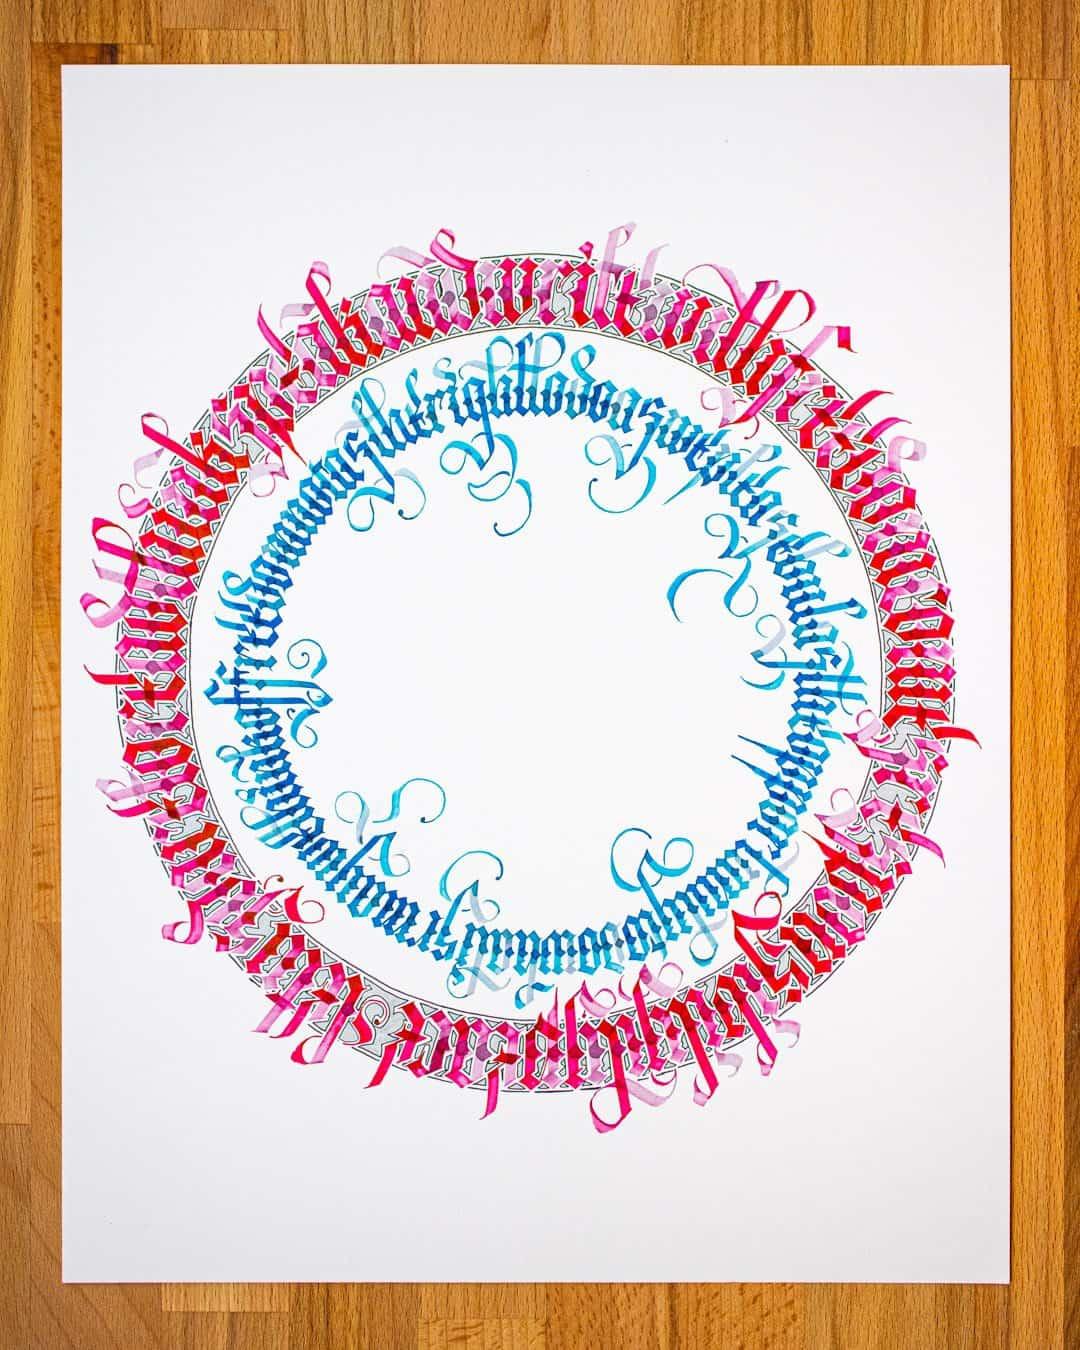 Cover image for the tutorial - circular calligram